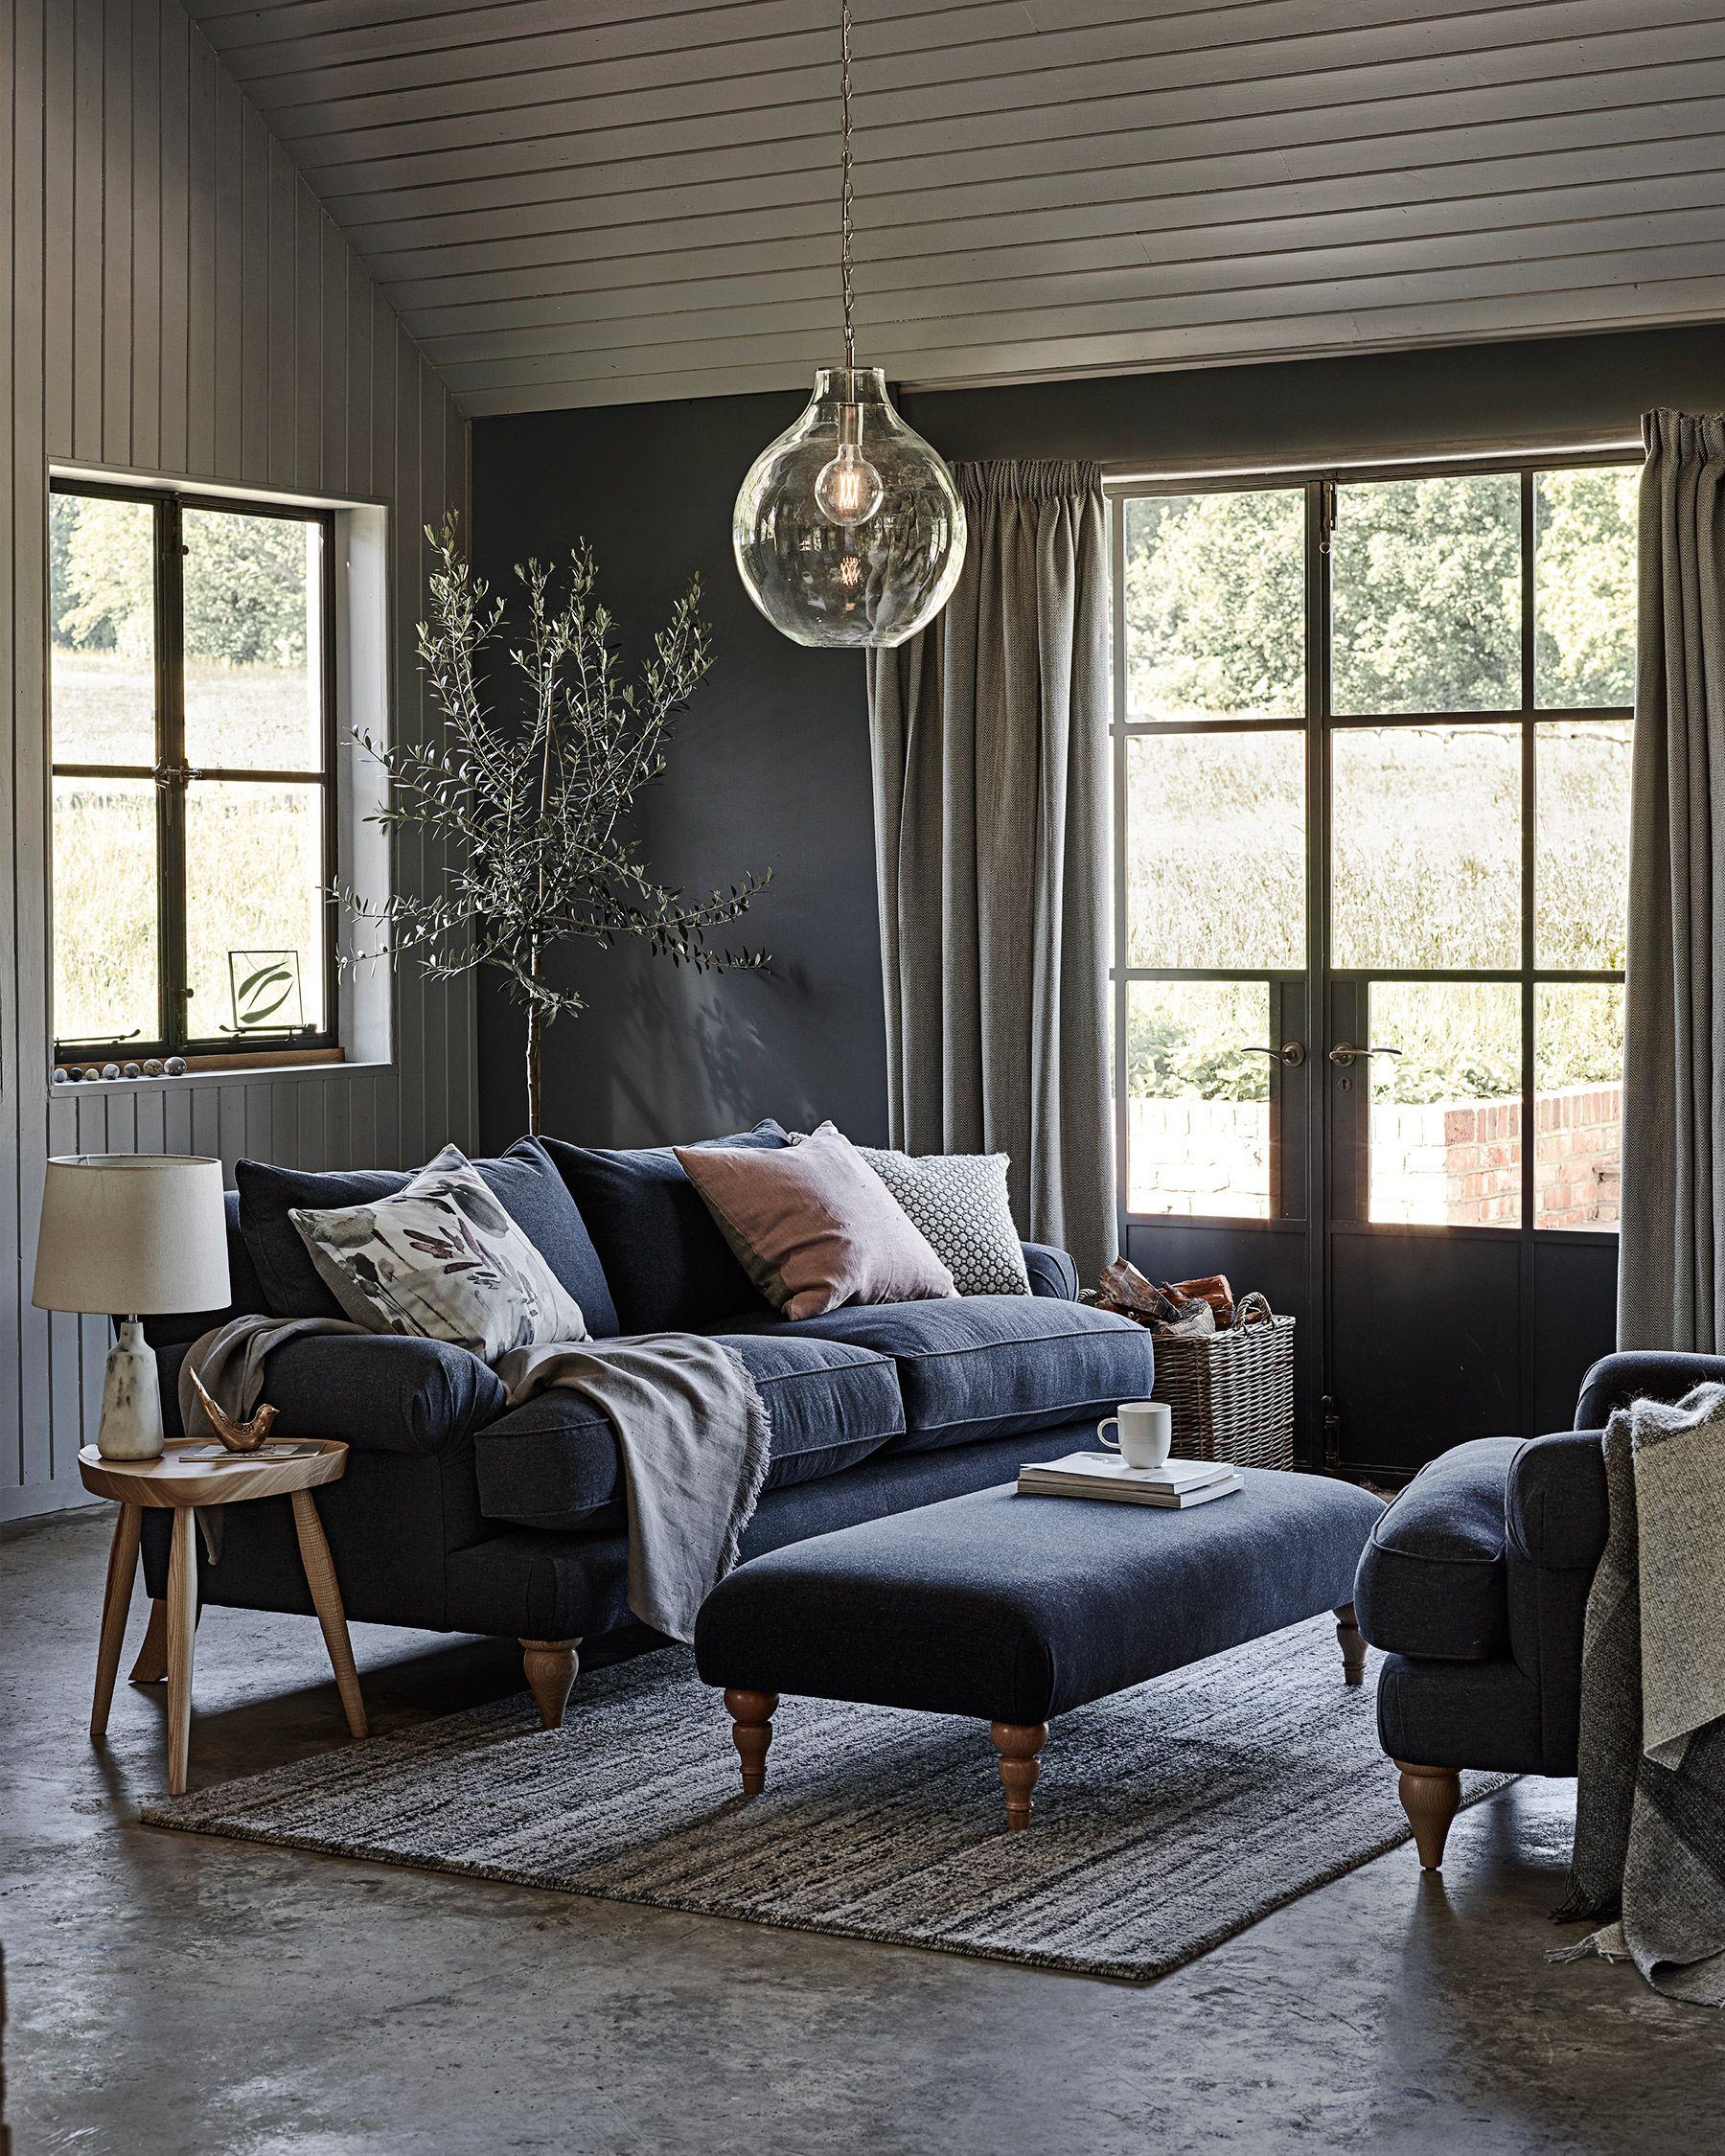 Jake Curtis Work Interiors Modern Rustic Living Room Living Room Grey Living Room Interior